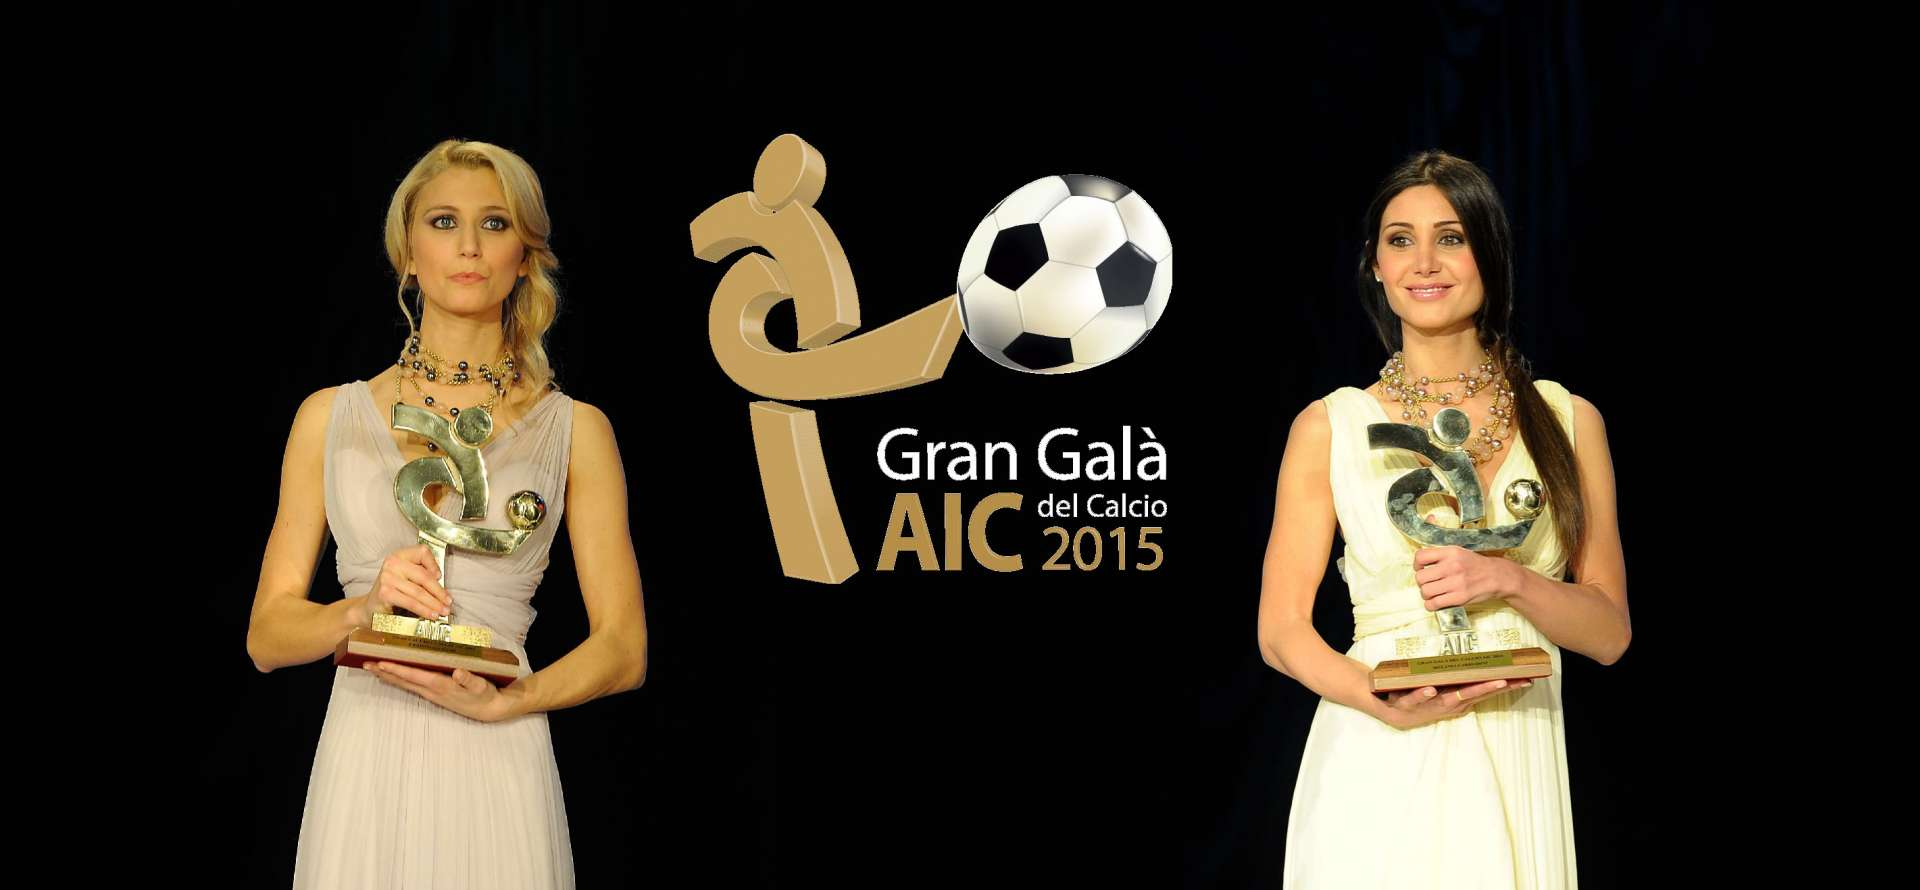 Gran Galà del Calcio AIC 2015